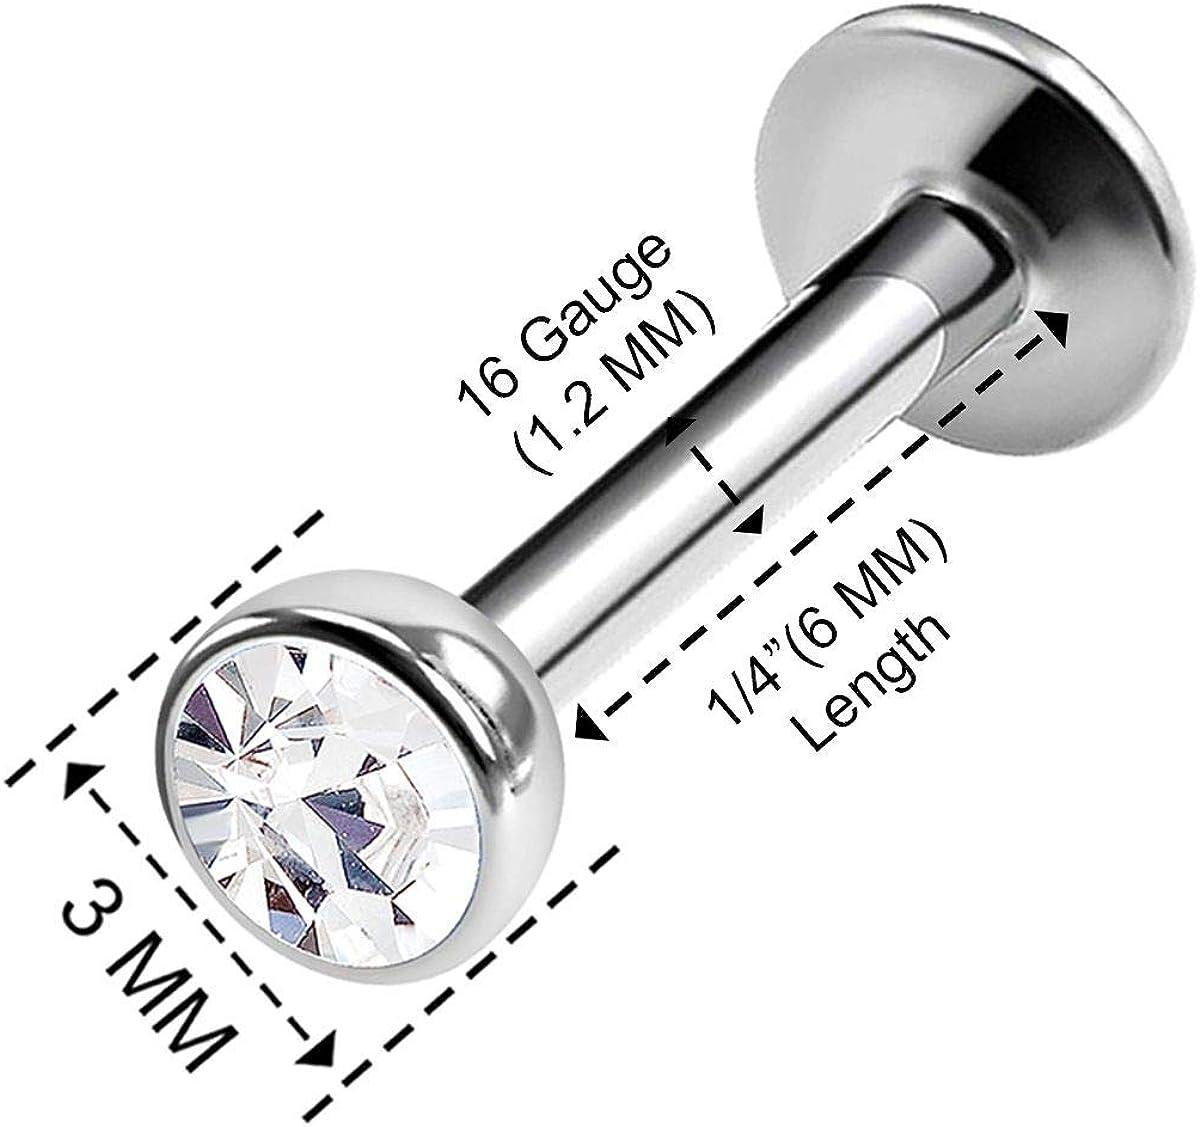 BanaVega 2PCS Steel Internally Threaded Labret Studs 16g 1/4 6mm 3mm Crystal Auricle Earrings Monroe Piercing Jewelry See More Colors